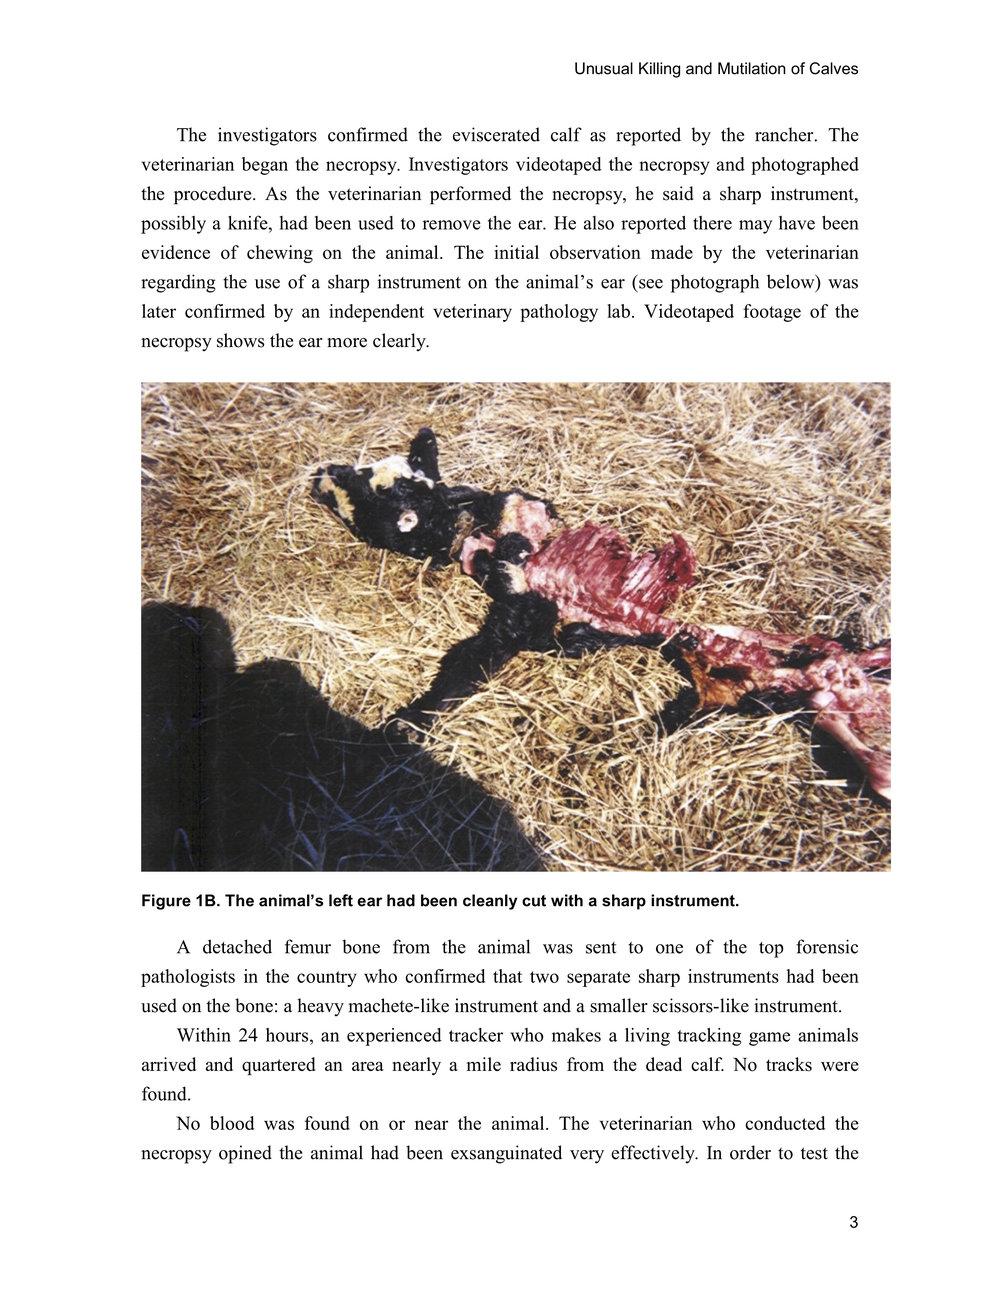 1997 ANIMAL MUTILATION REPORT 2.jpg